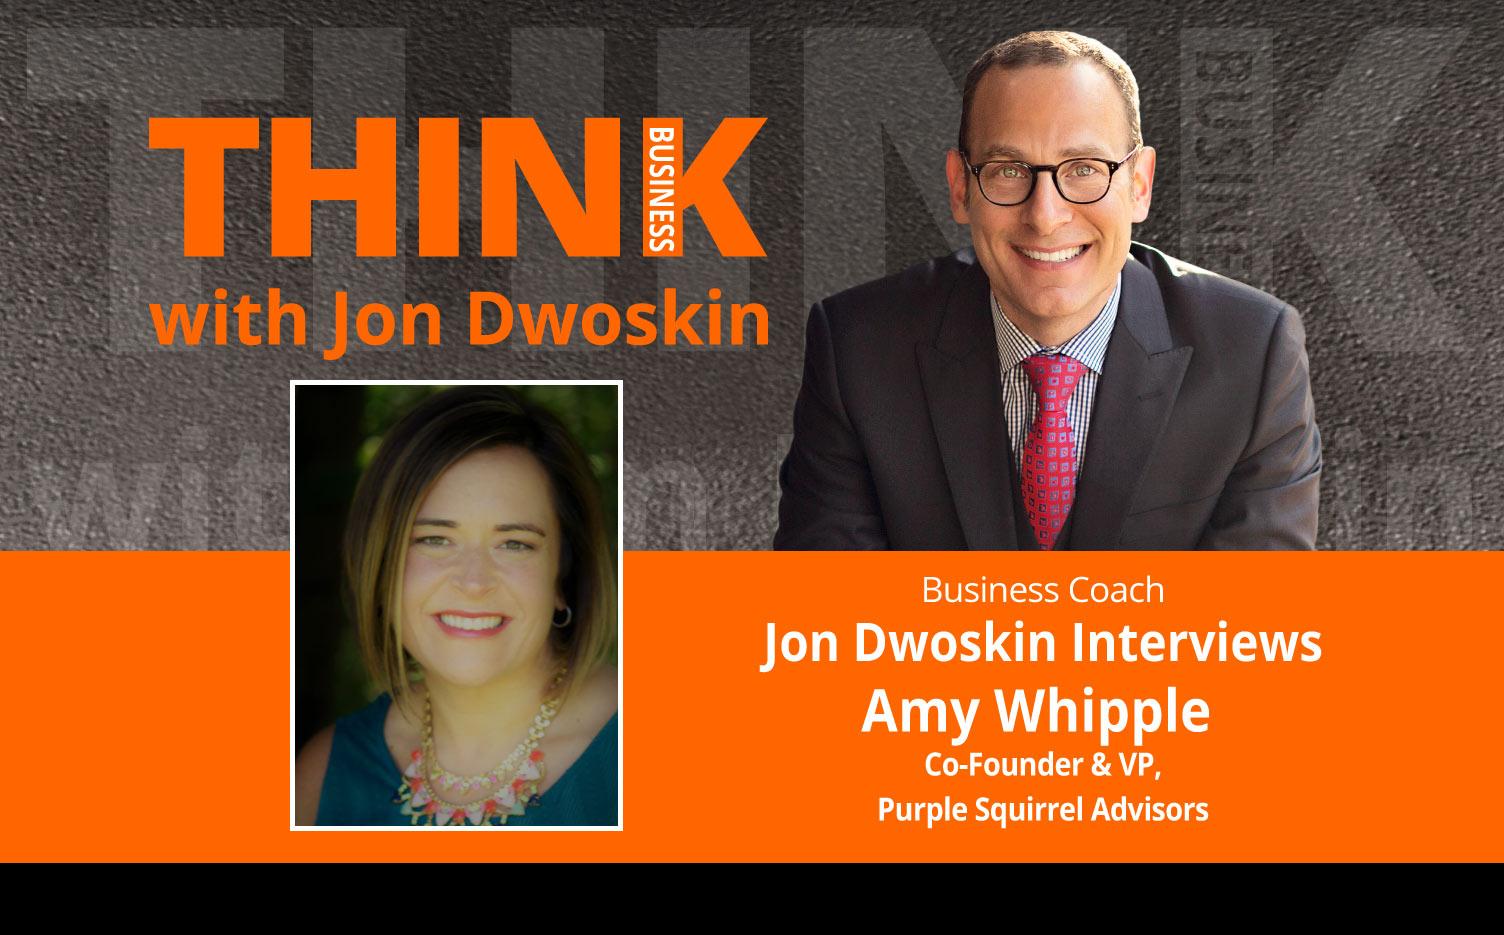 THINK Business: Jon Dwoskin Interviews Amy Whipple, Co-Founder & VP, Purple Squirrel Advisors